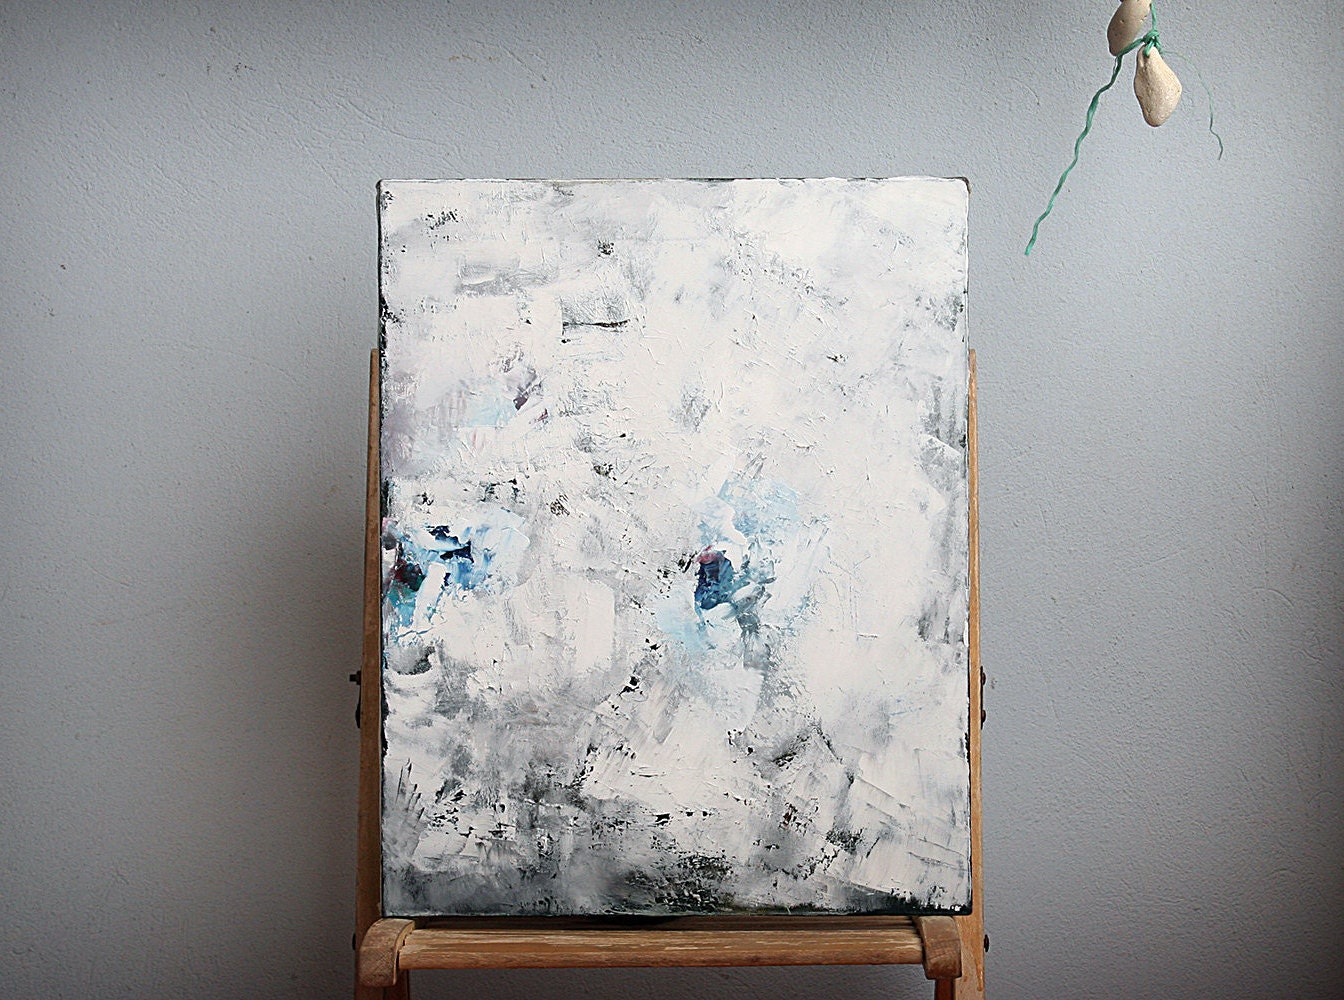 lgem lde auf leinwand kunst malerei abstrakte moderne von. Black Bedroom Furniture Sets. Home Design Ideas